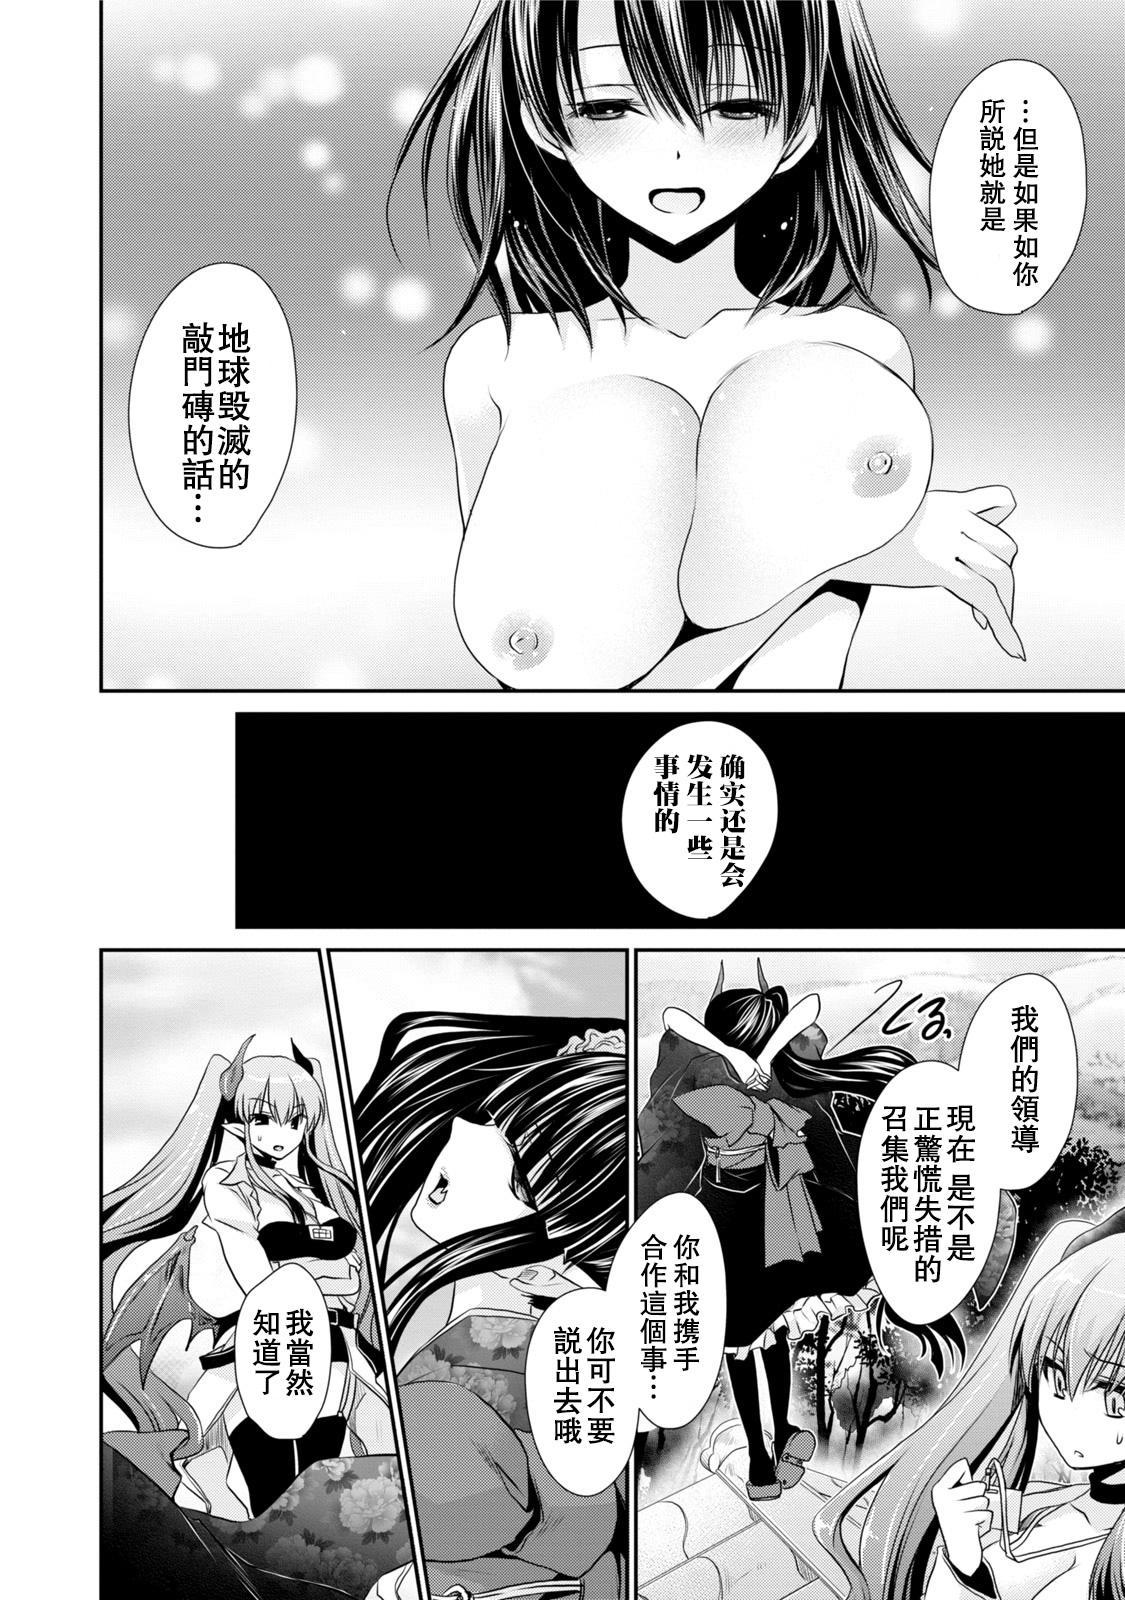 [Shinonome Ryu] Ore to Kanojo to Owaru Sekai - World's end LoveStory ch.1-9 [Chinese] [爱弹幕汉化组] [Digital] 187